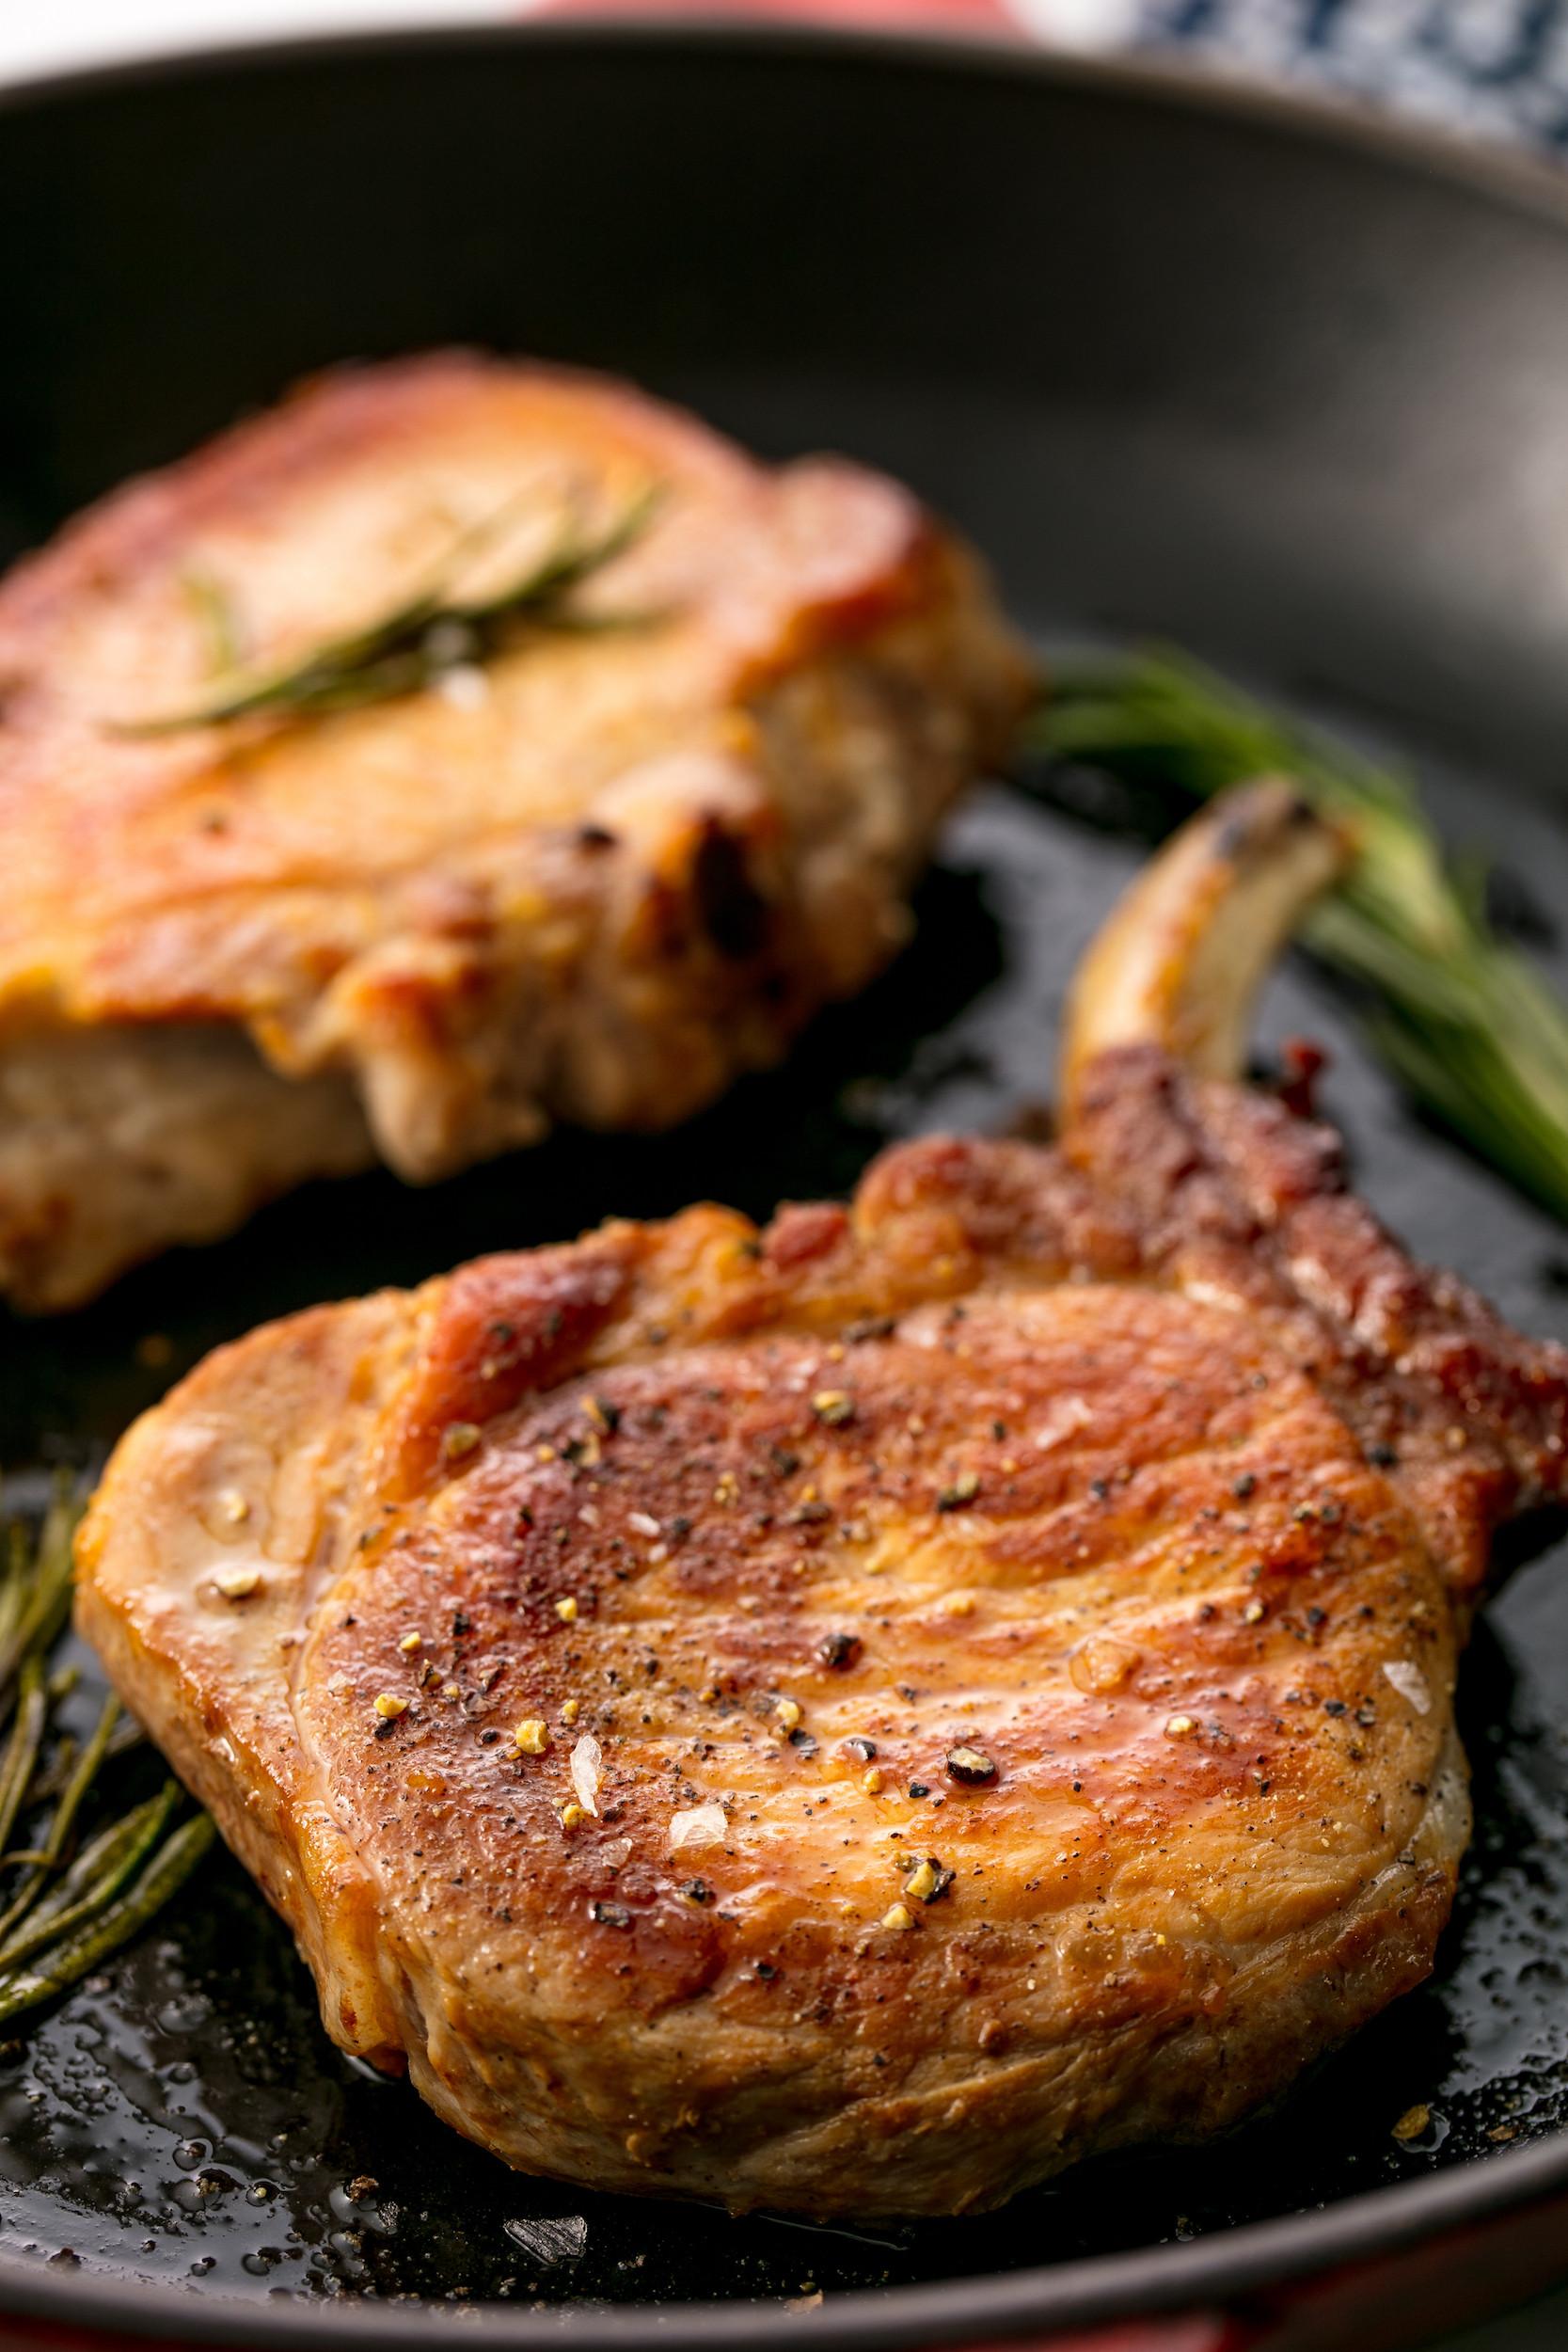 Best Way To Make Pork Chops  20 Best Pork Chop Recipes How To Cook Pork Chops—Delish